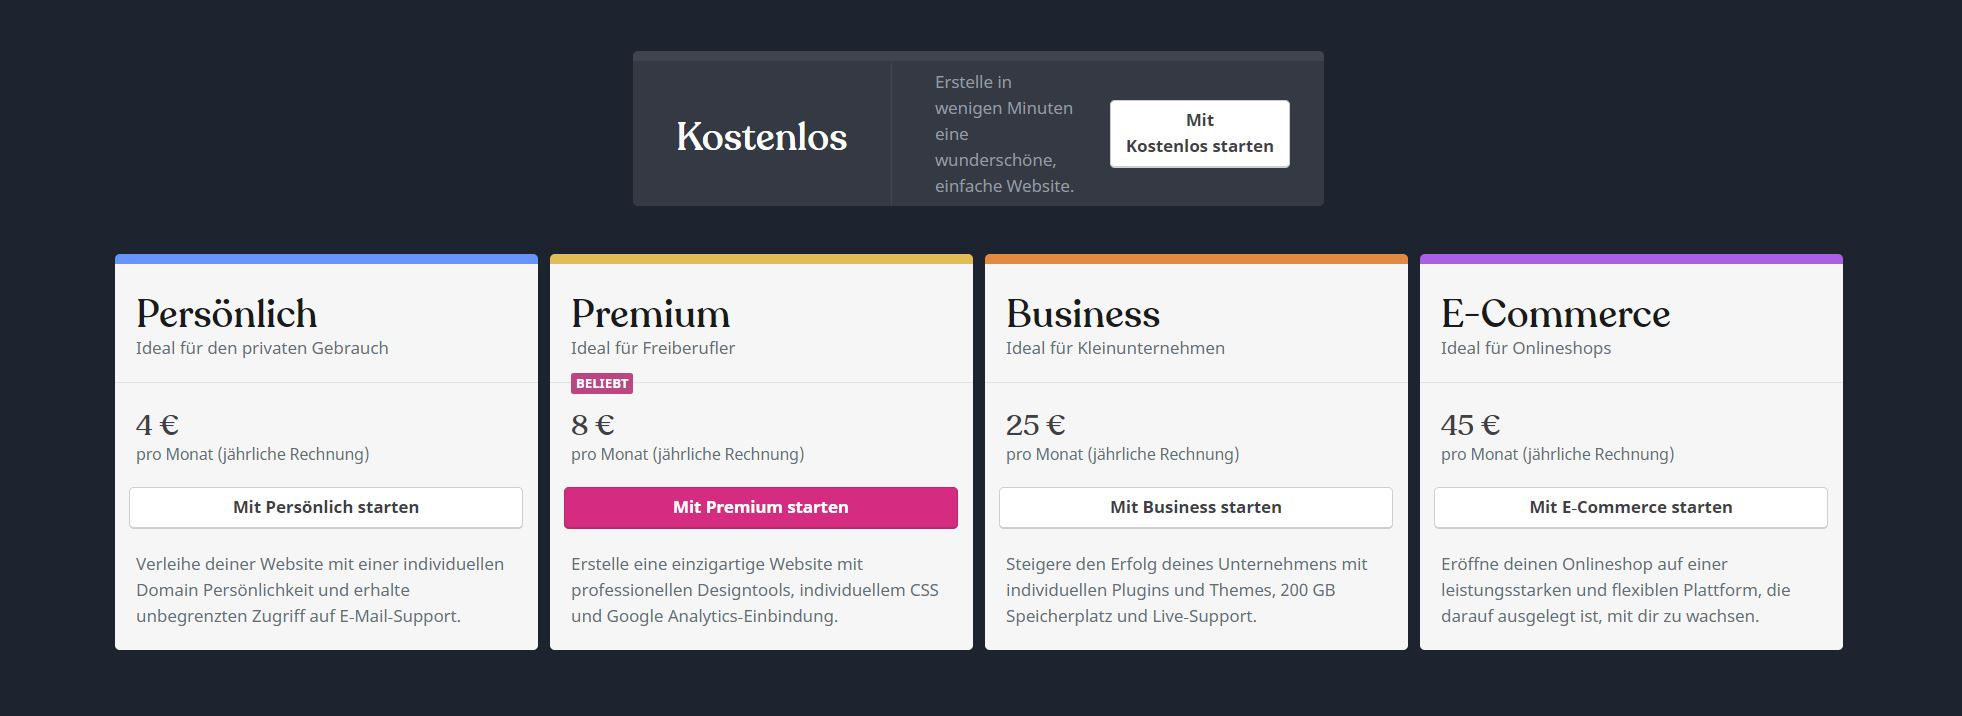 WordPress tarife im Überblick